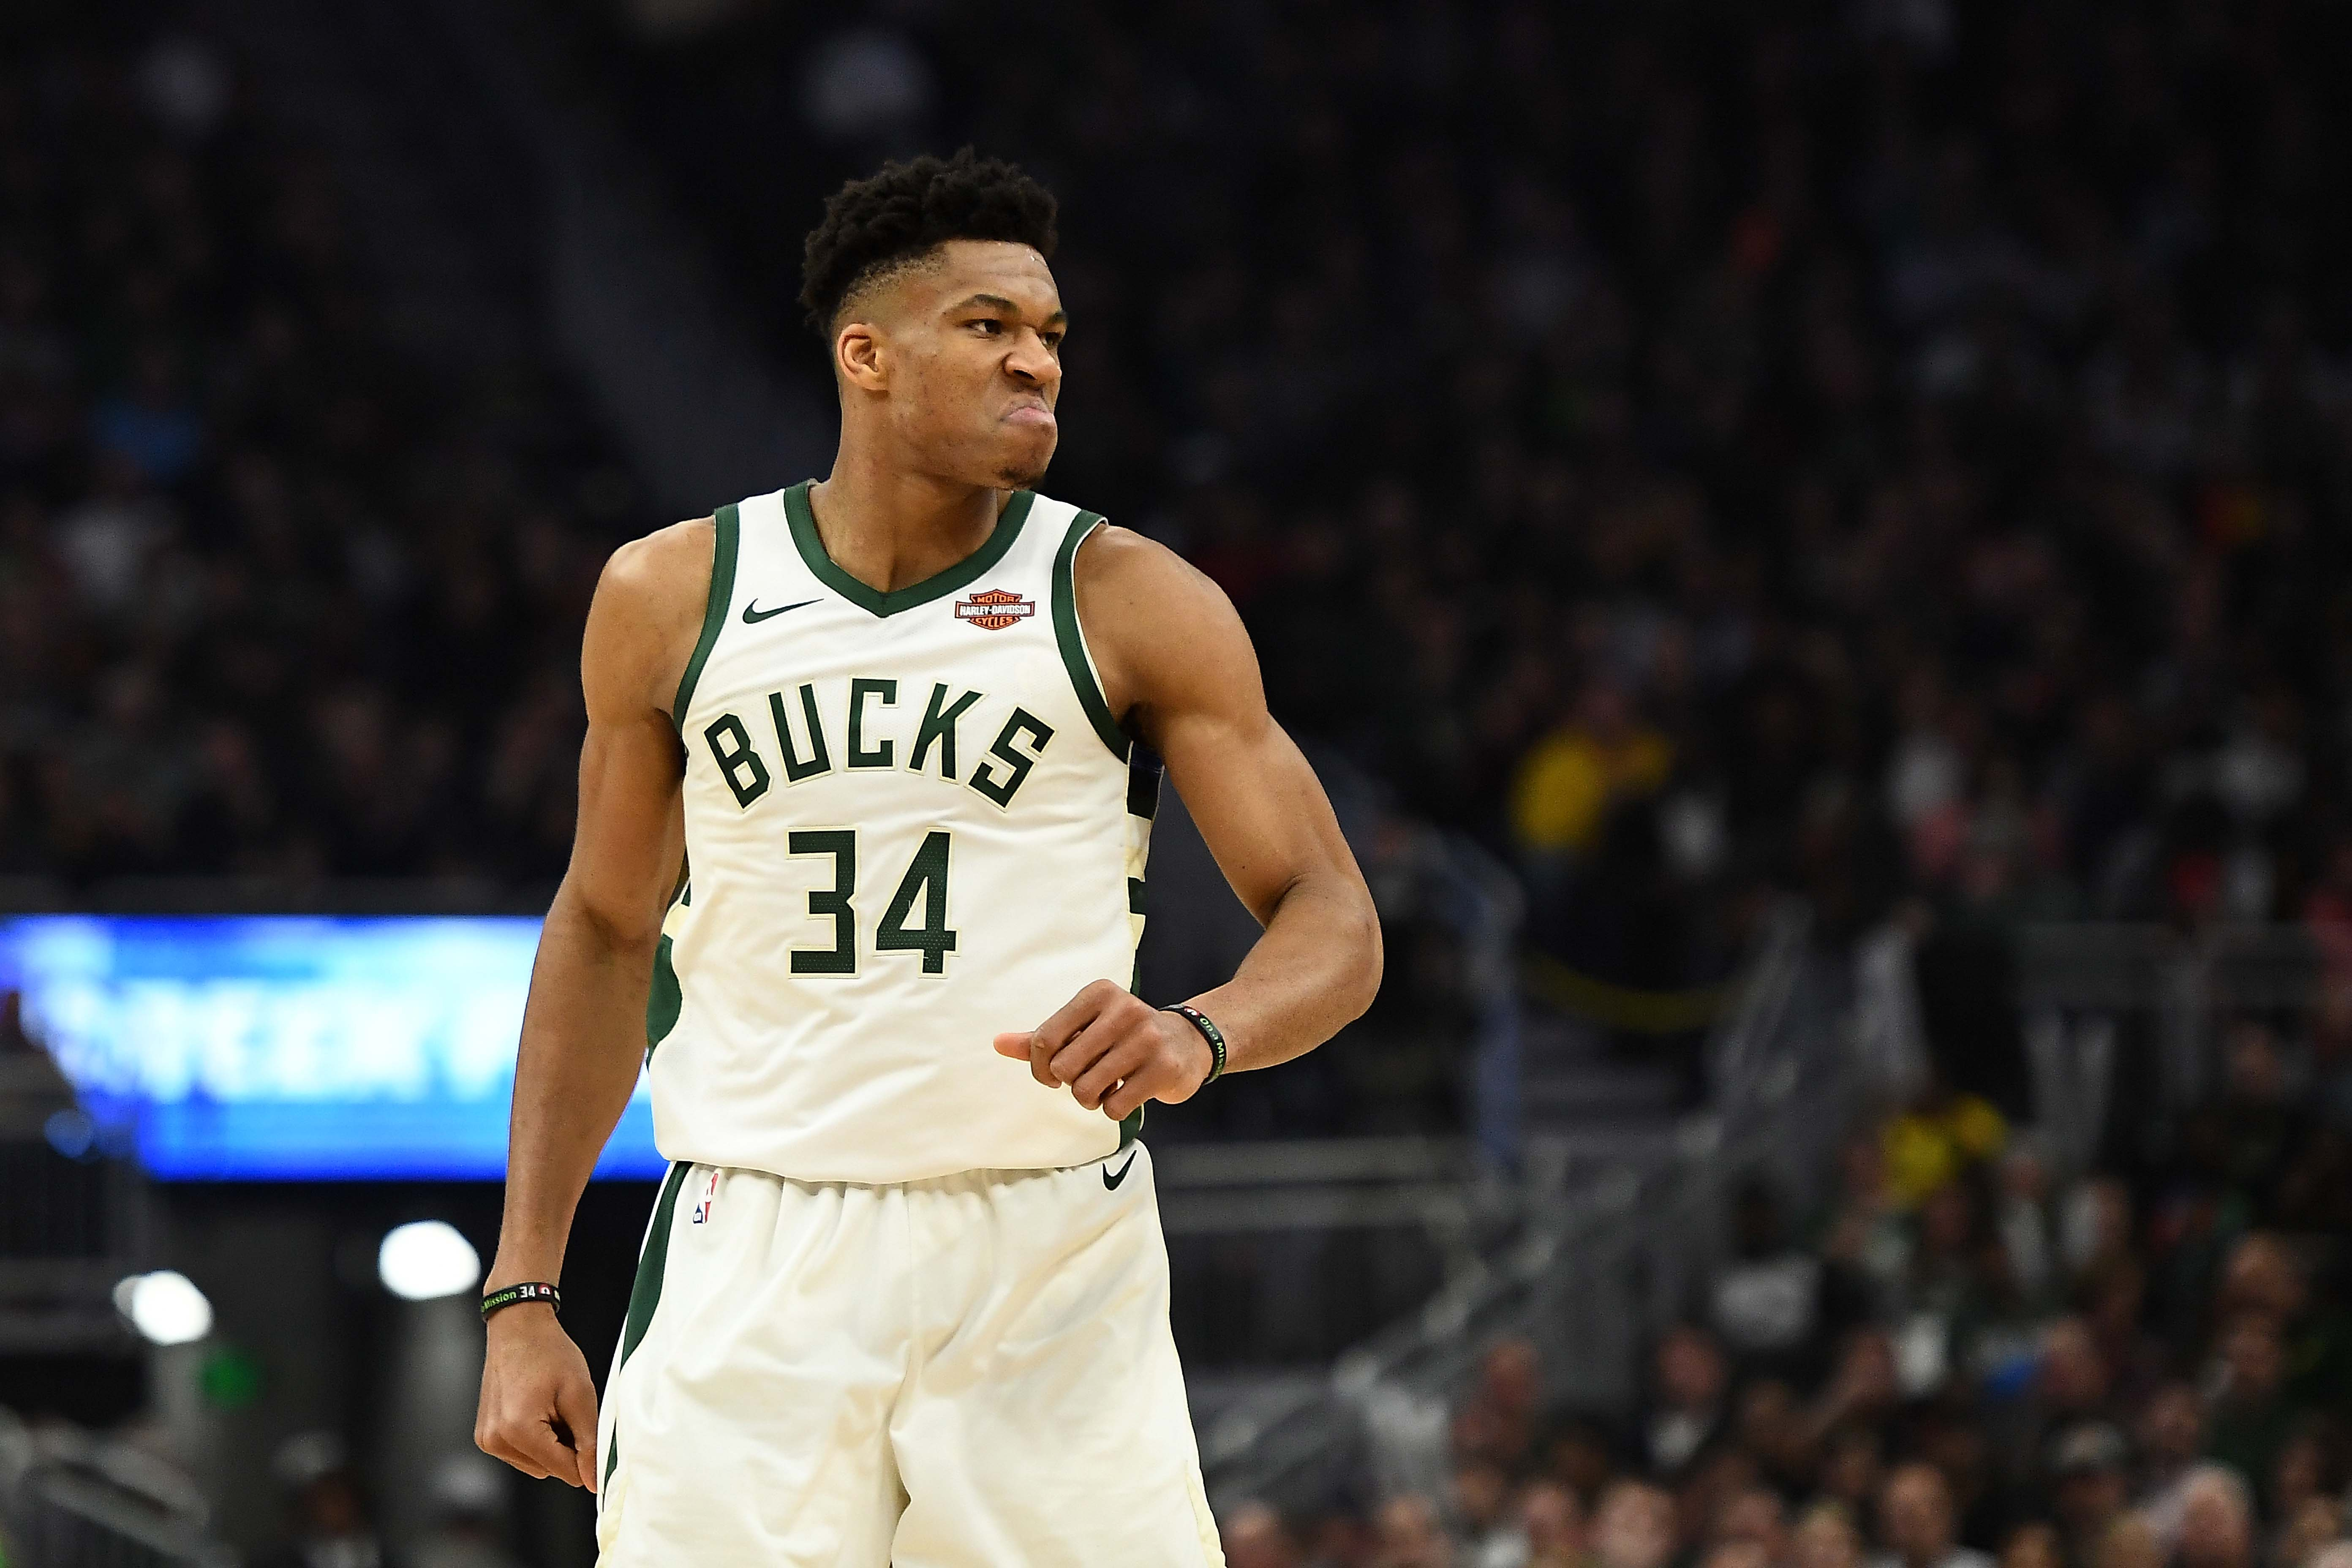 NBA 季后赛 2019 − 东霸天 Milwaukee Bucks 以不败之姿横扫首轮晋级